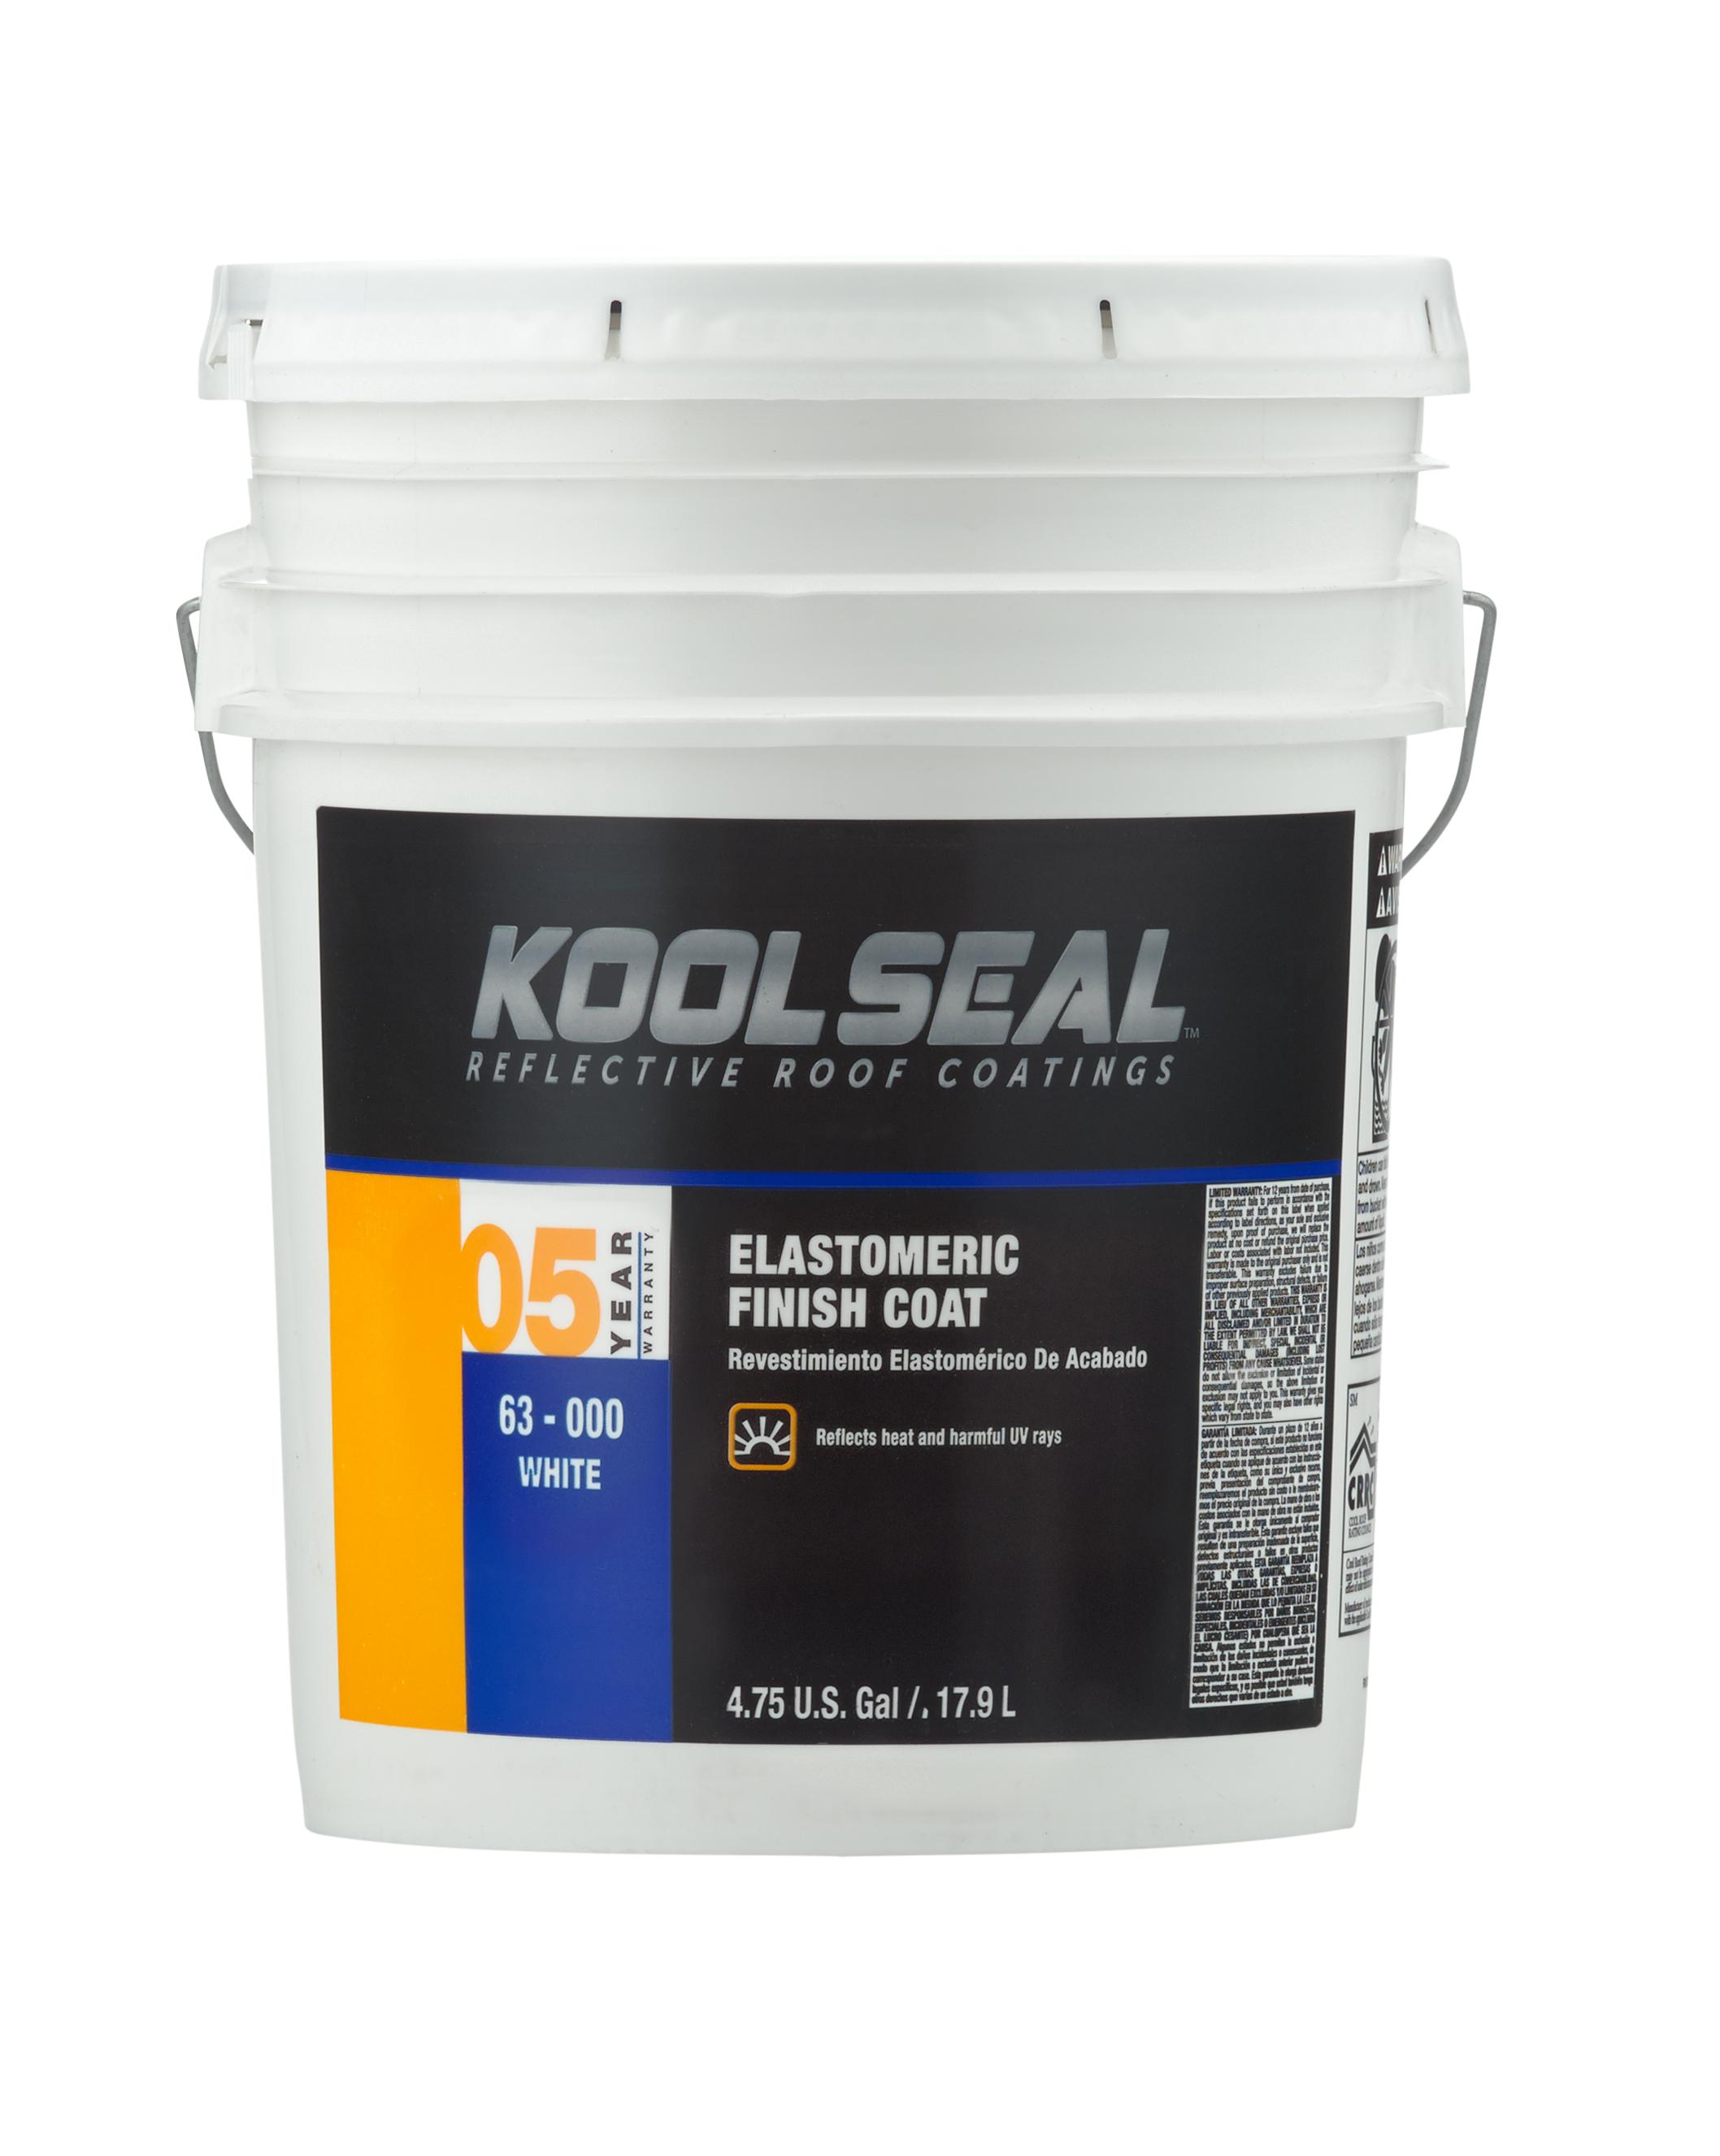 Elastomeric Finish Coat 5yr Koolseal